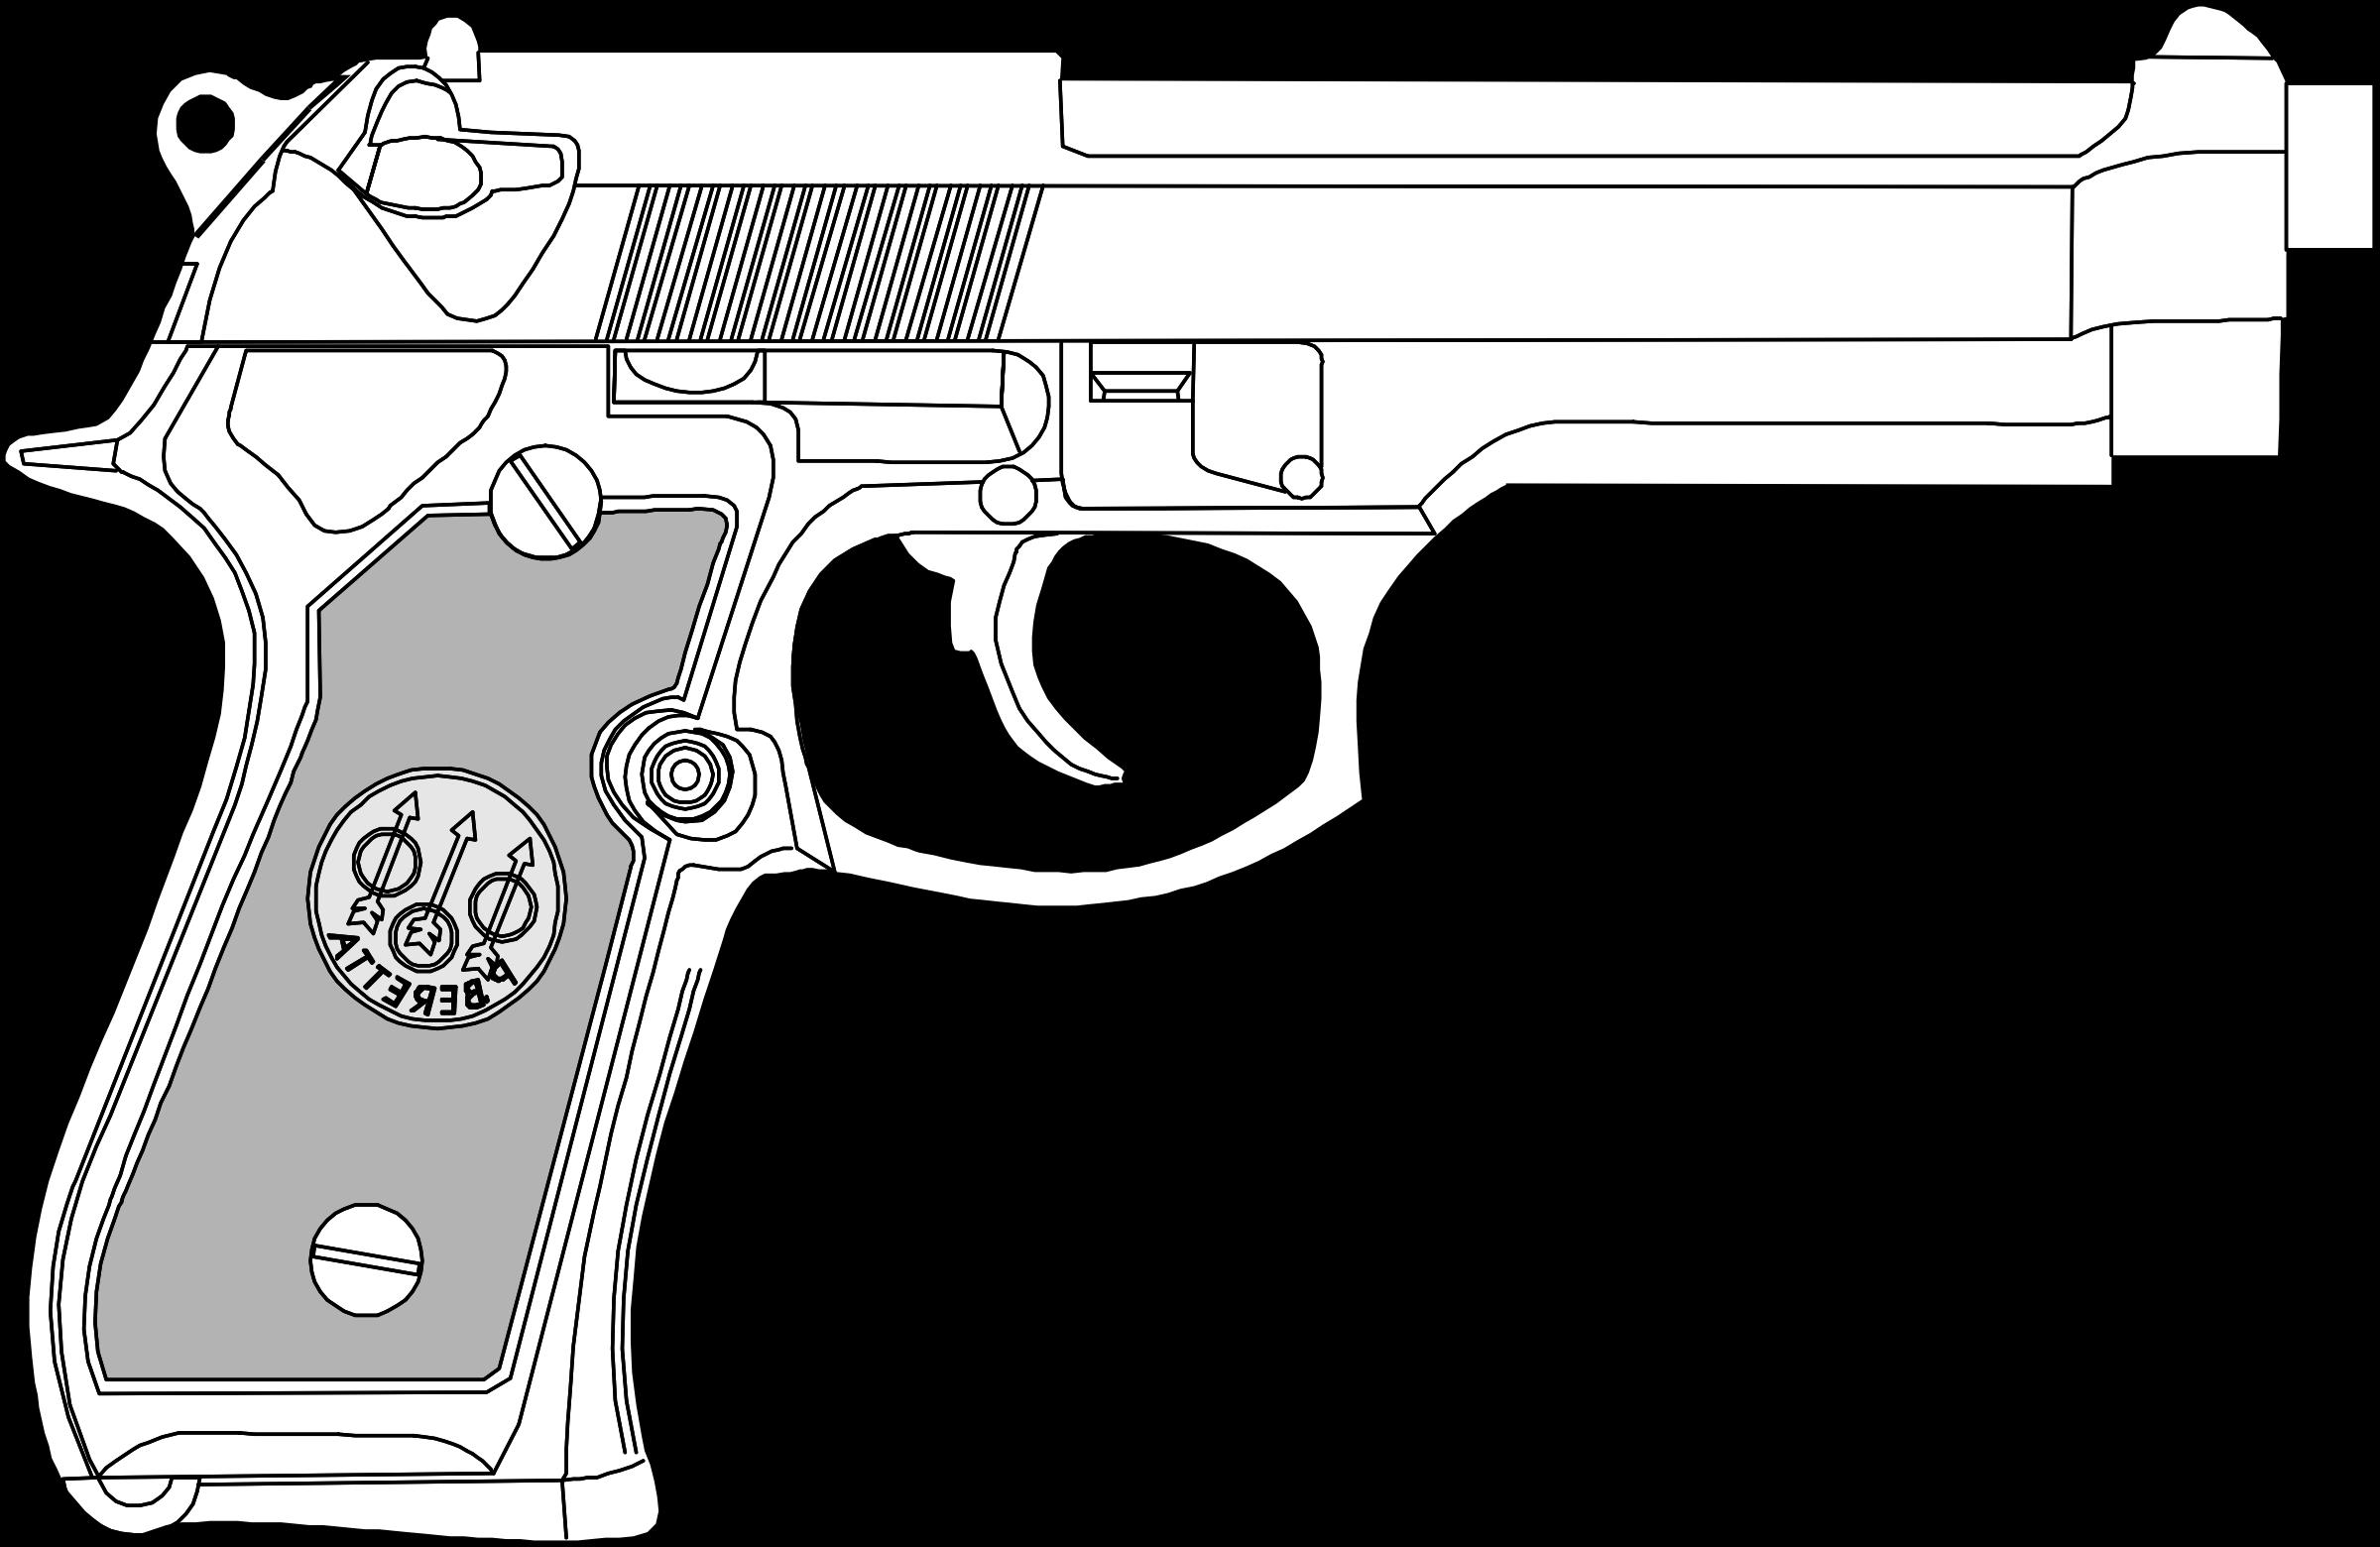 image royalty free download Bullet clipart 9mm. Mm pistol big image